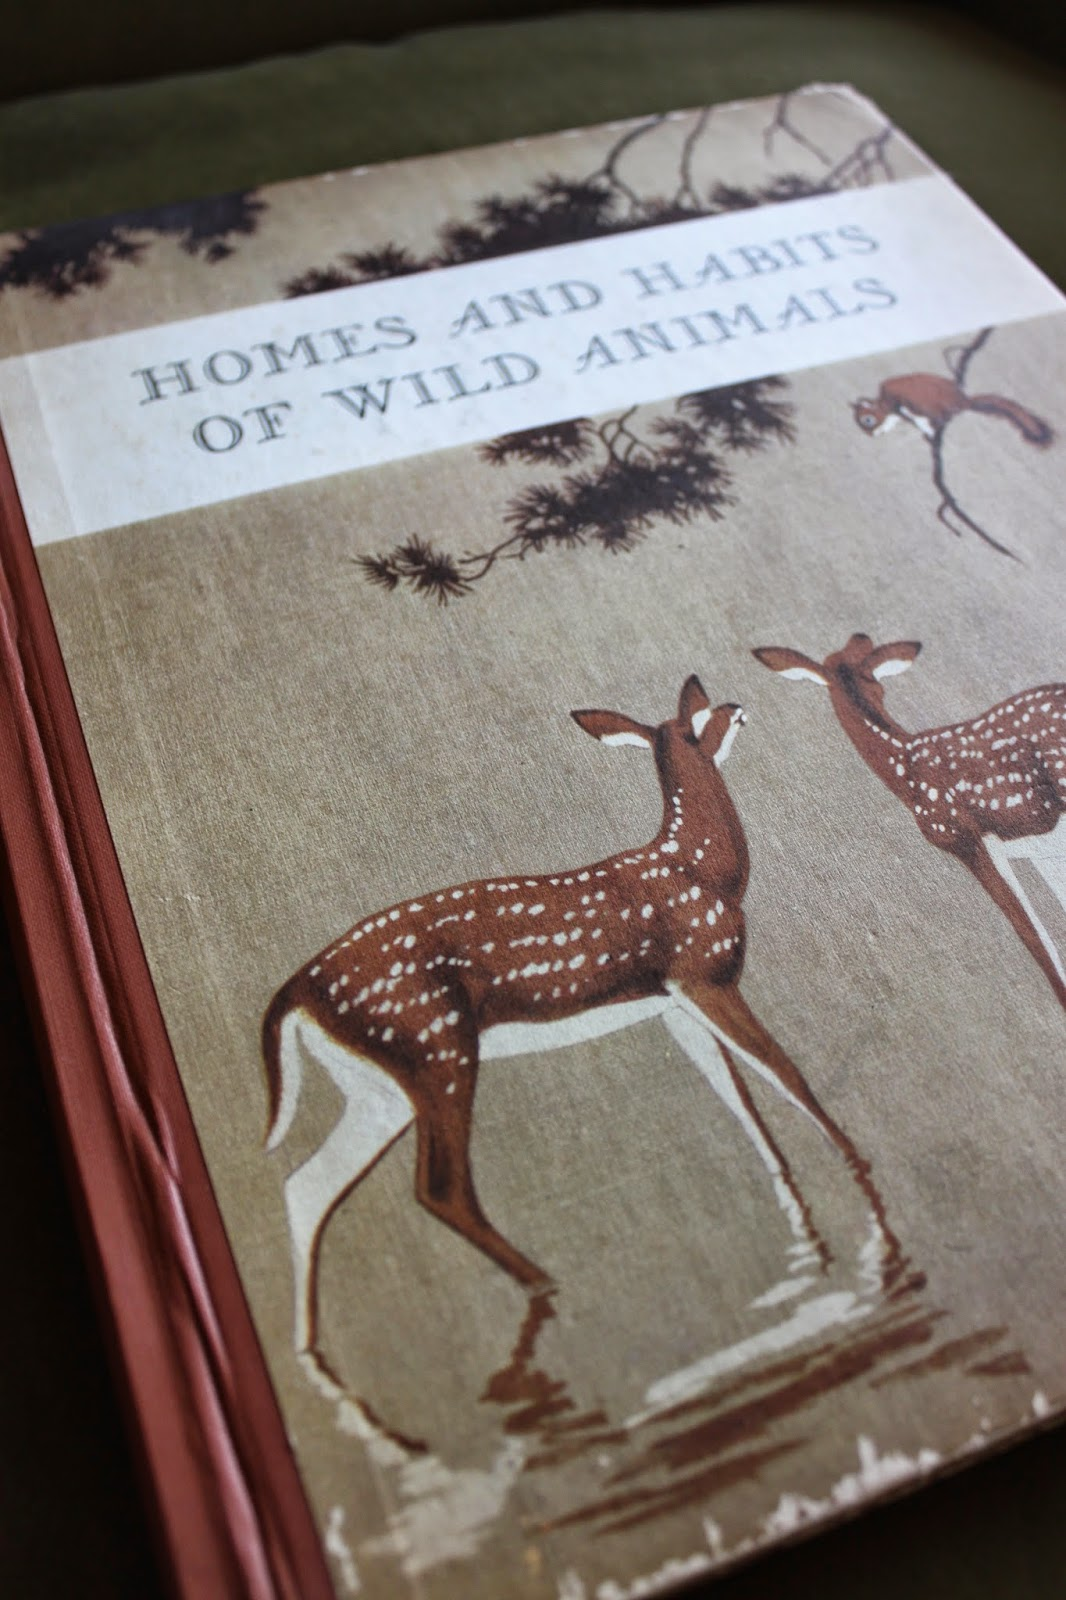 the marlowe bookshelf homes and habits of wild animals